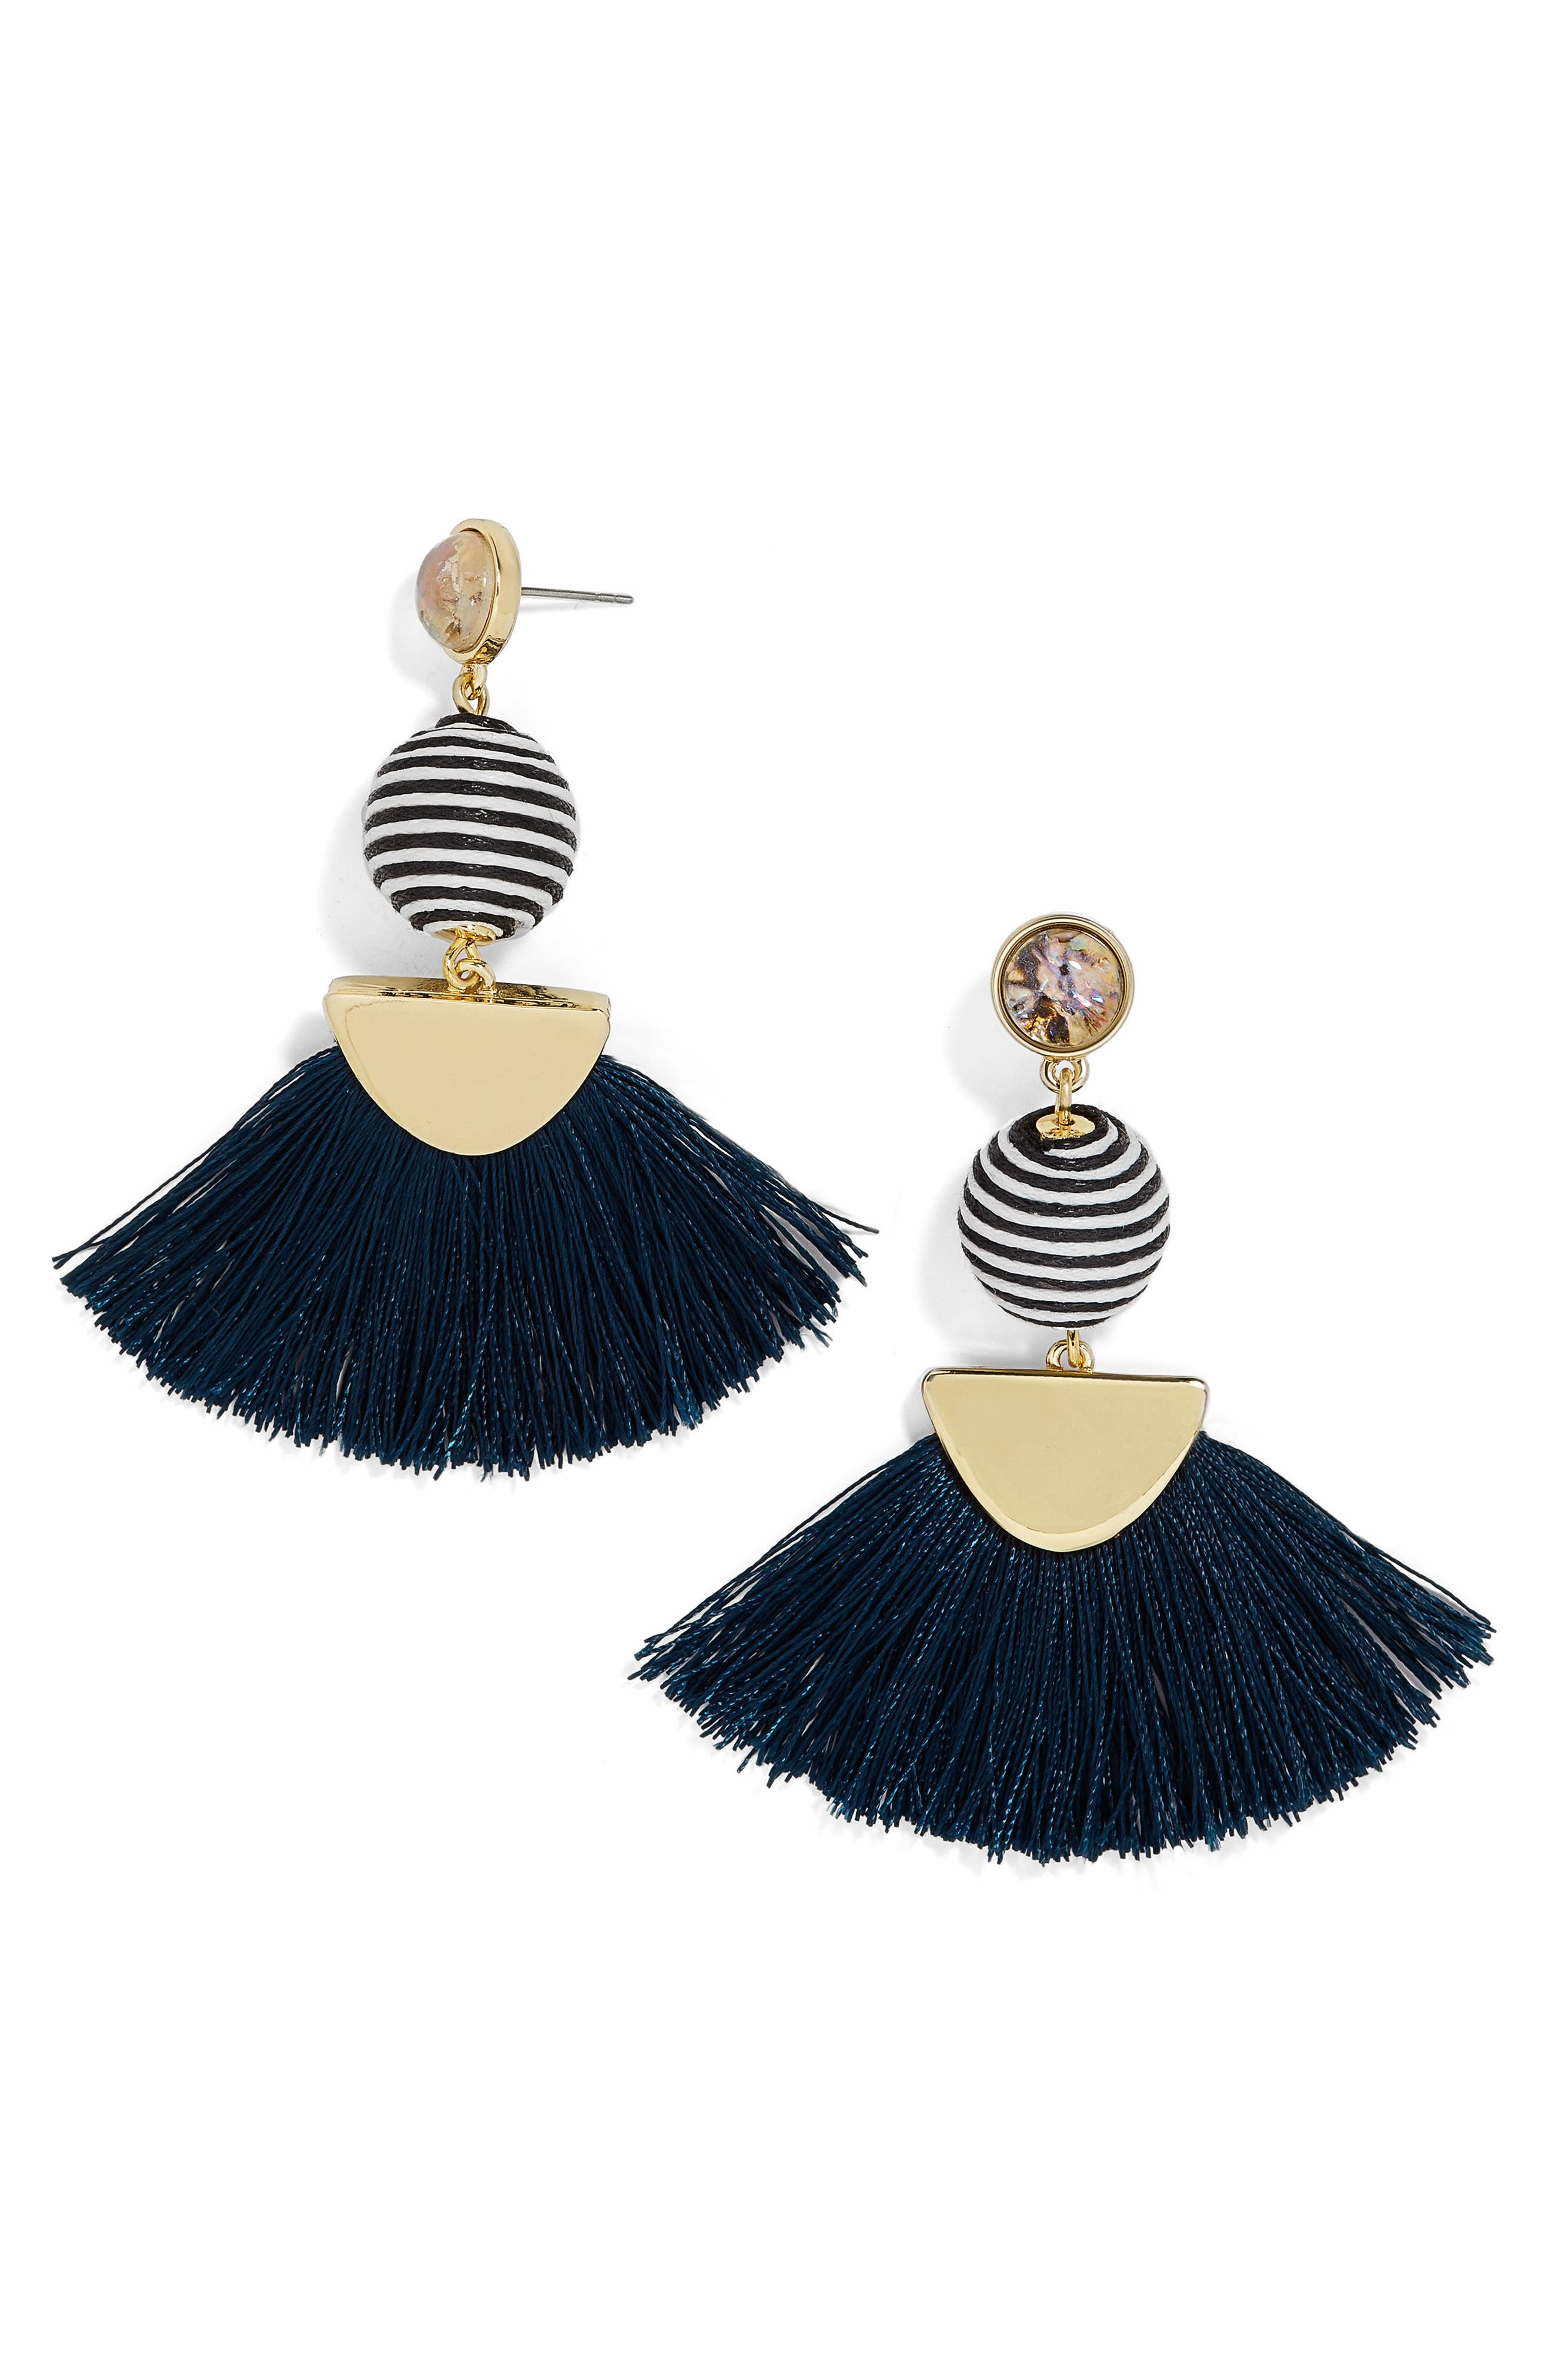 Mamba Fringe Earrings,                             Main thumbnail 1, color,                             Navy/ Stripe